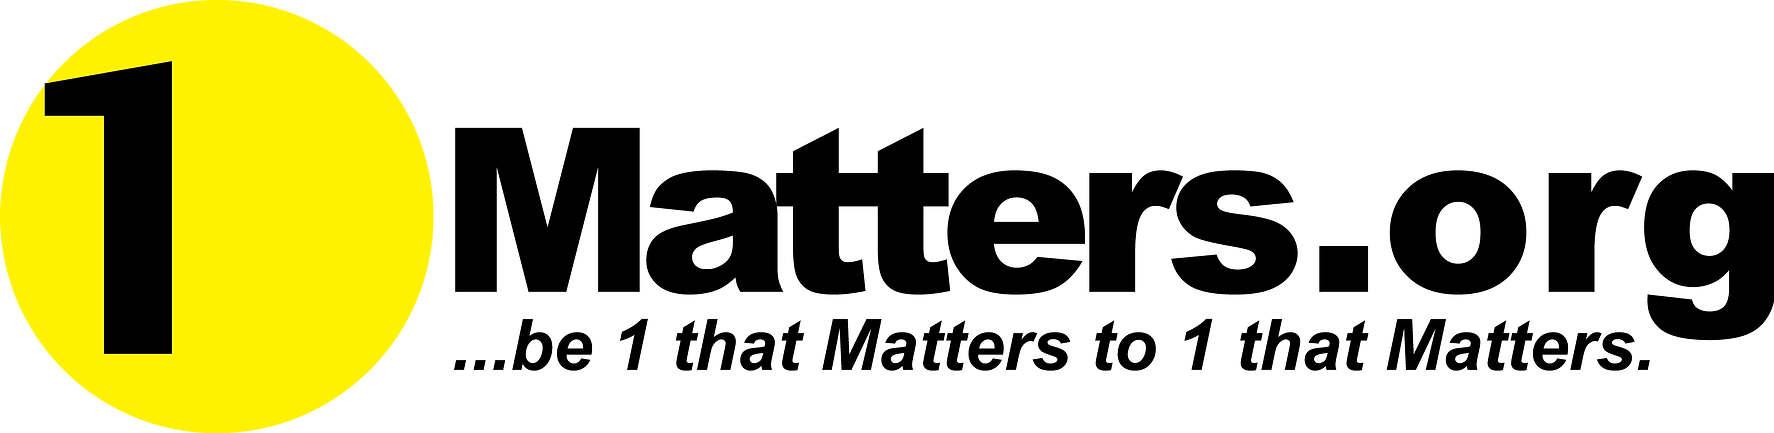 1Matters.org